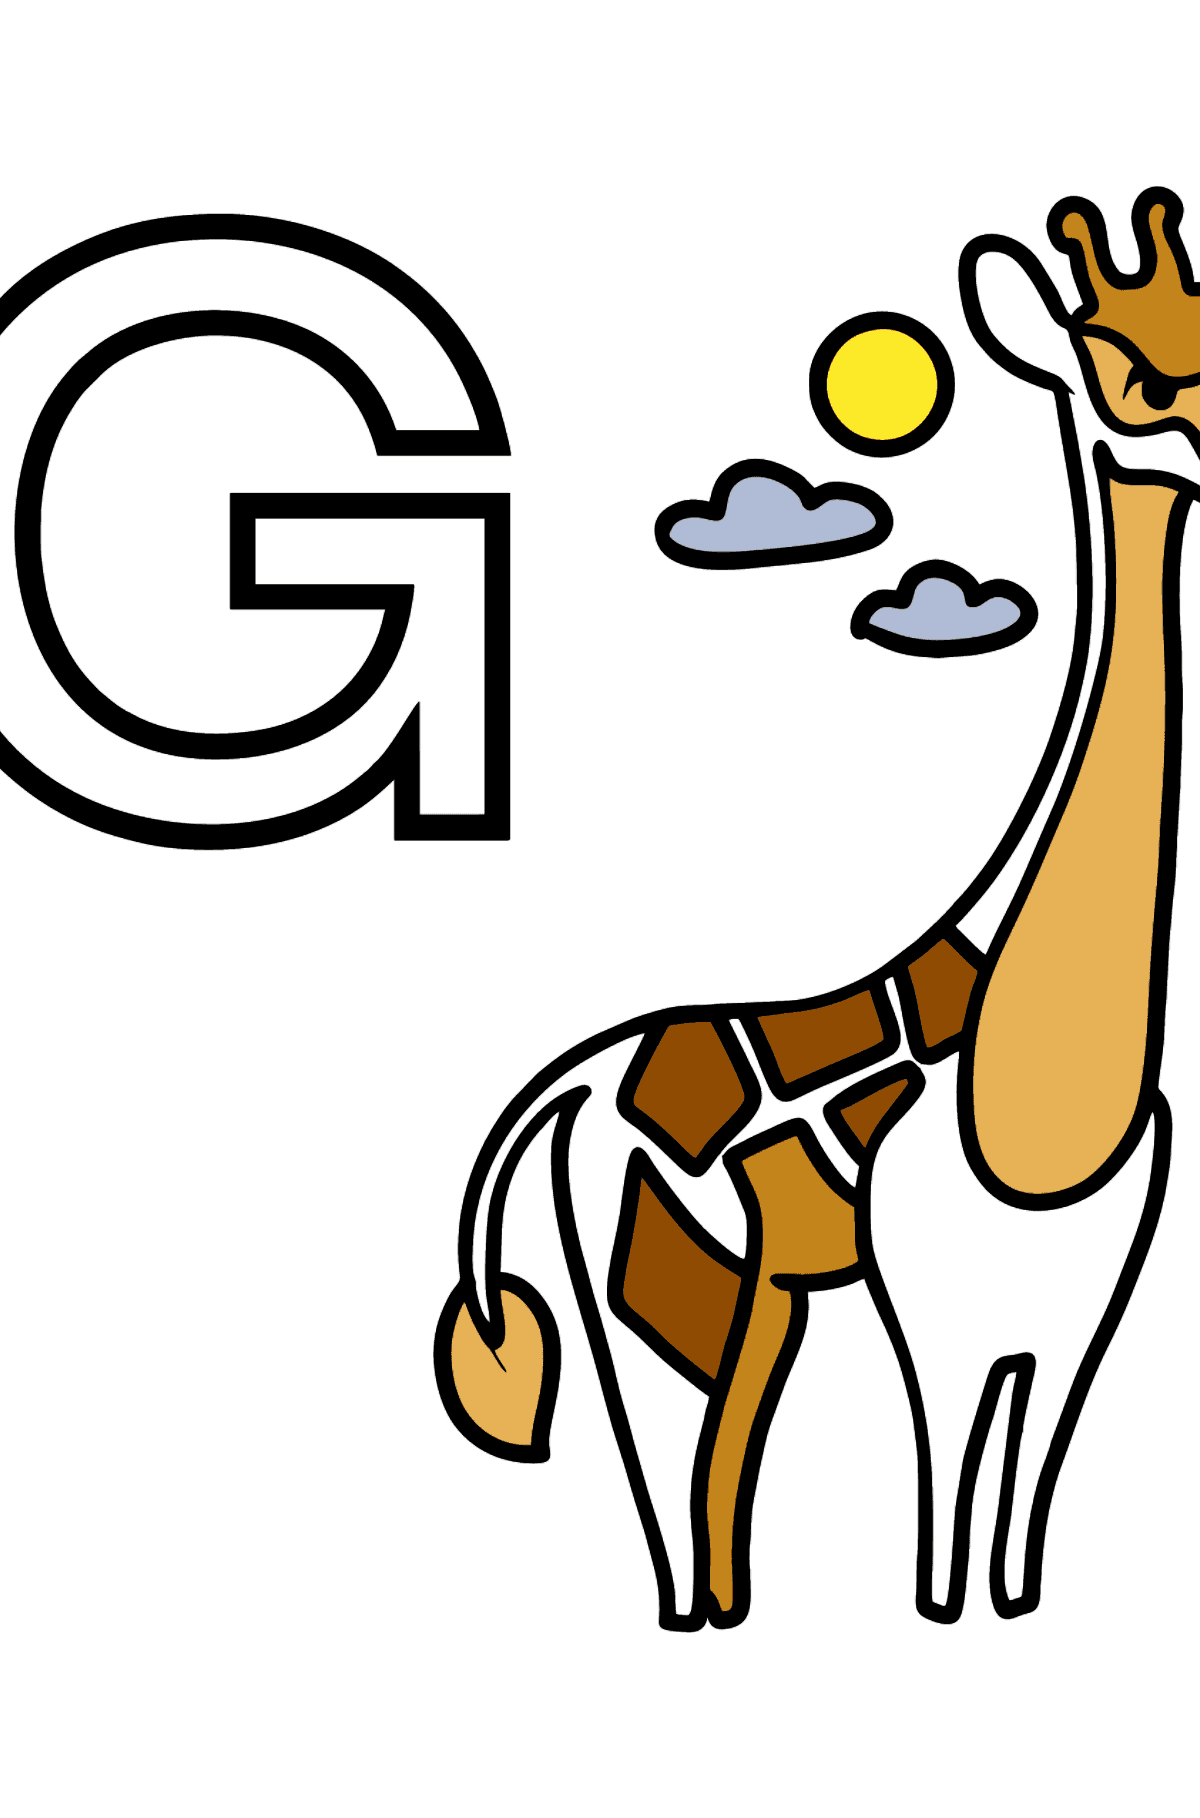 Dibujo de Letra G inglesa para colorear - GIRAFFE - Dibujos para Colorear para Niños